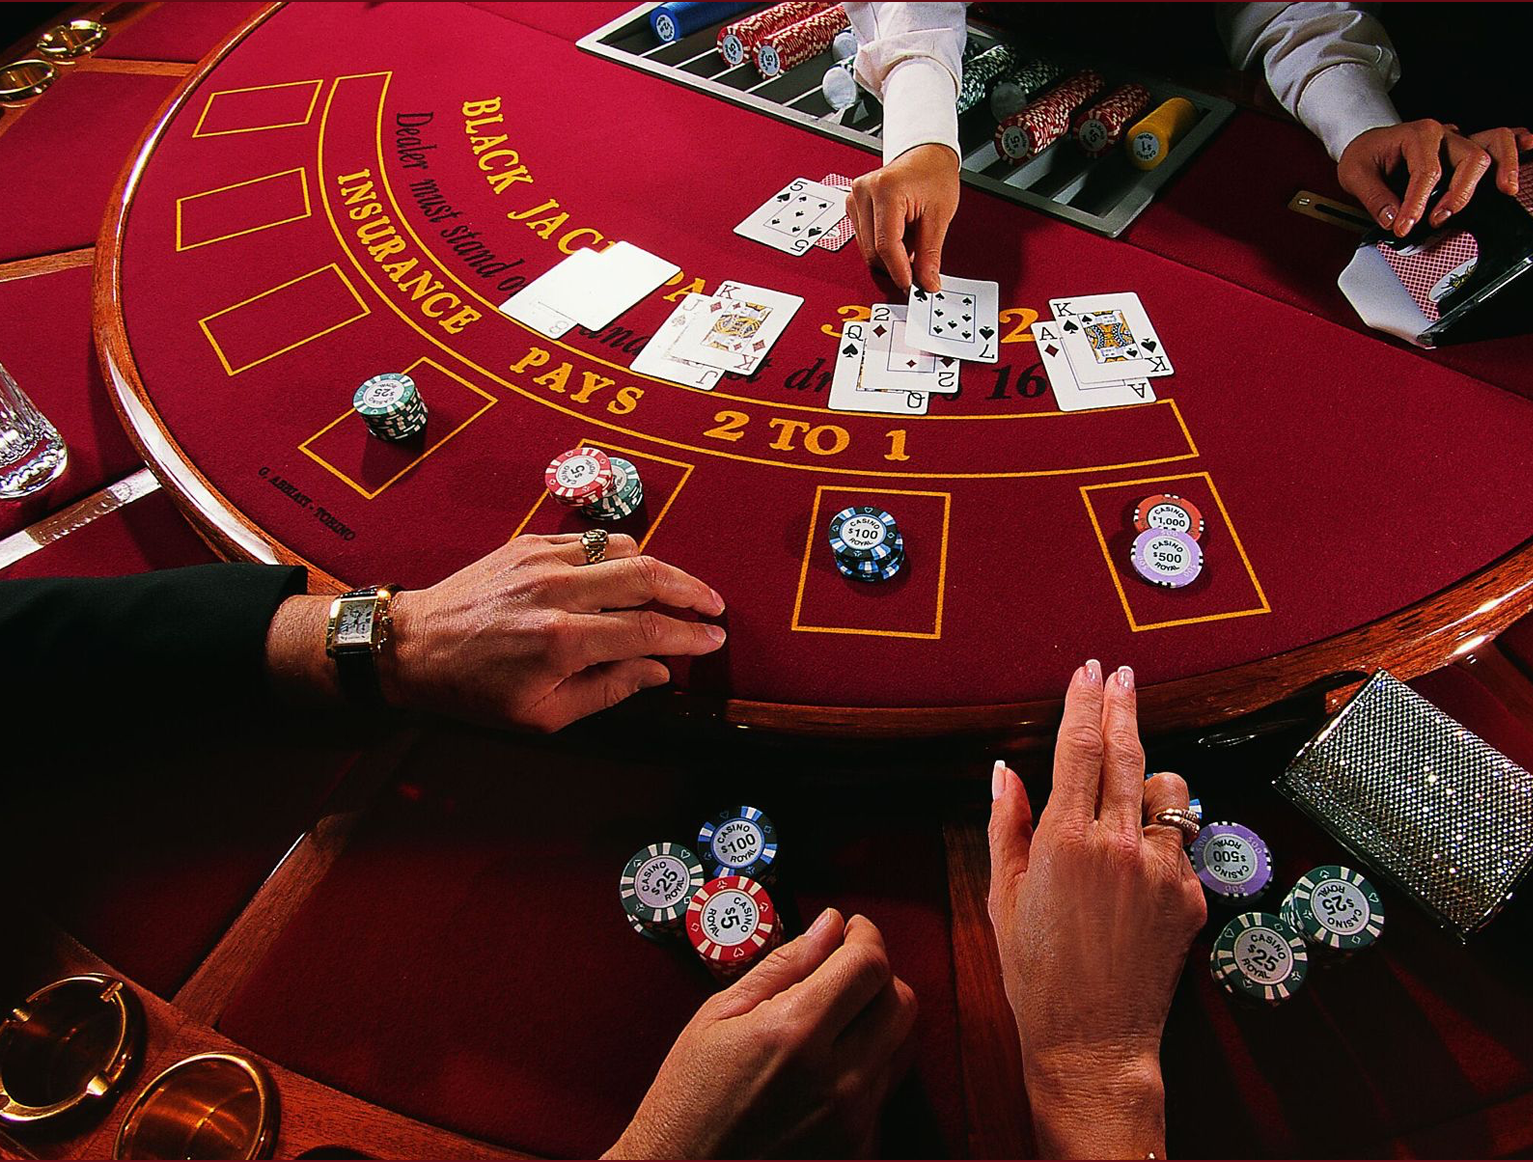 udar-po-banku-kazino